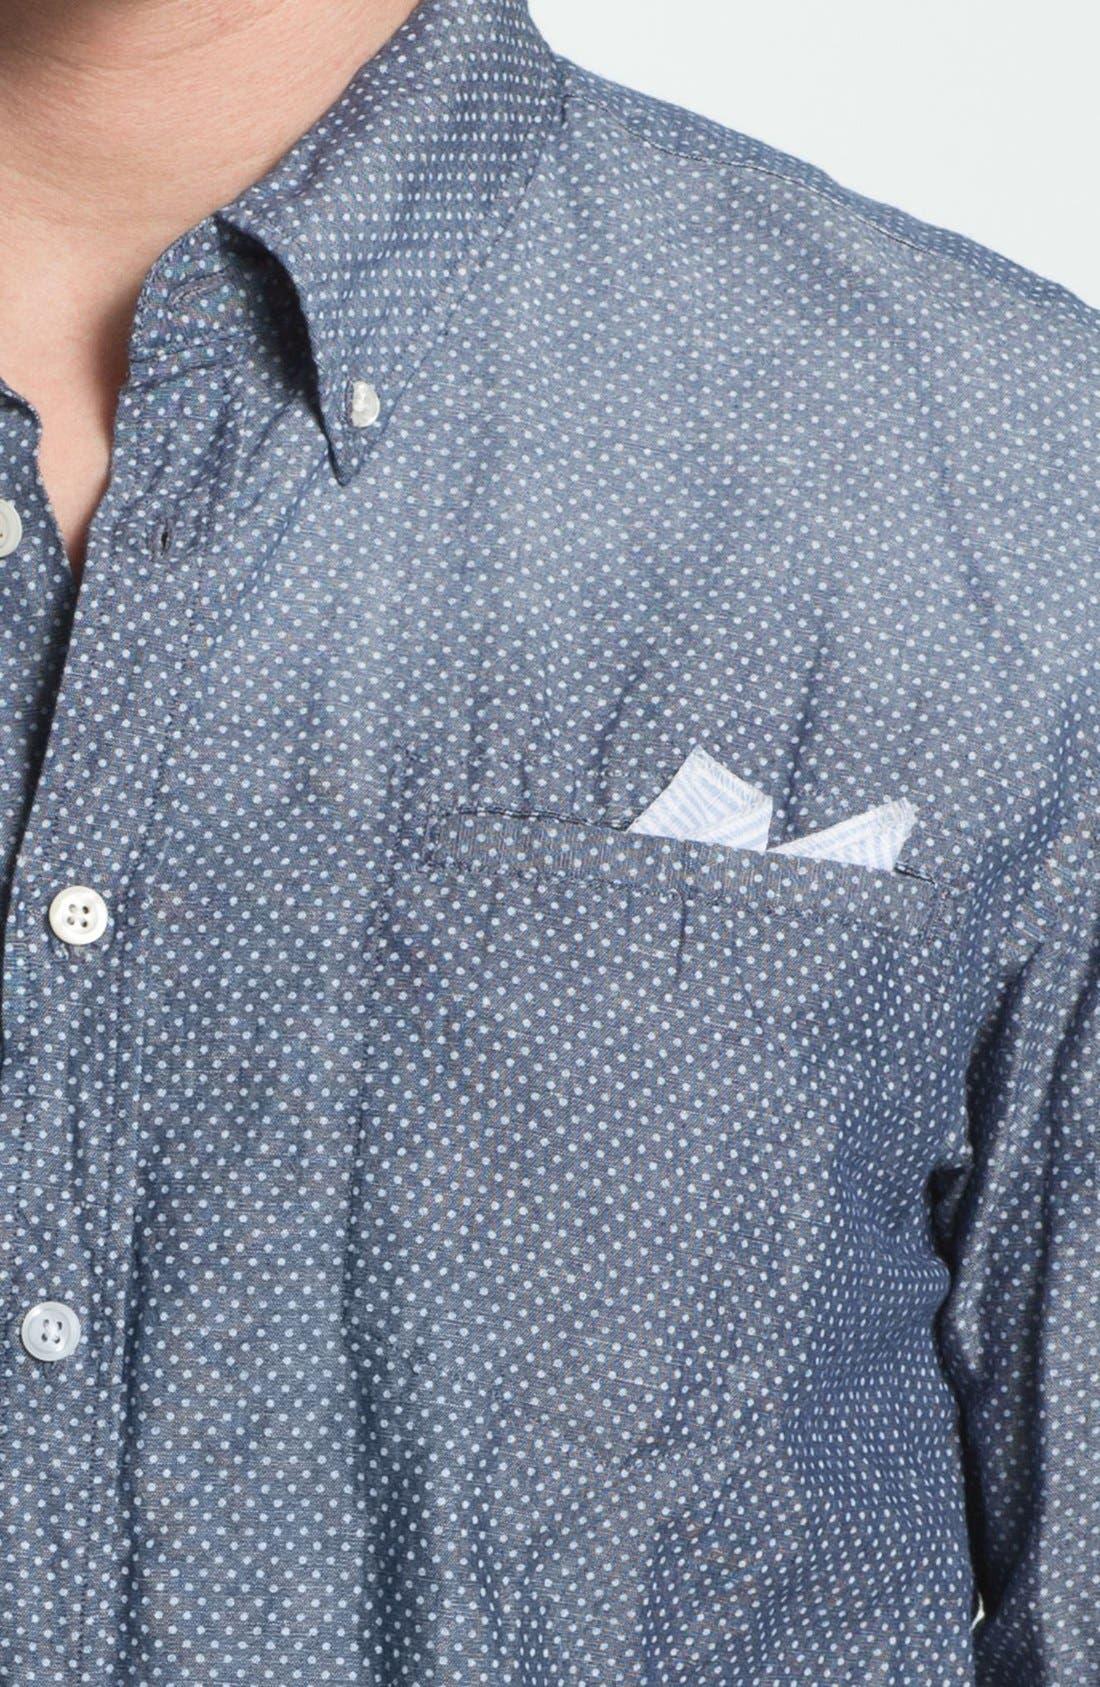 Alternate Image 3  - Scotch & Soda Trim Fit Chambray Shirt